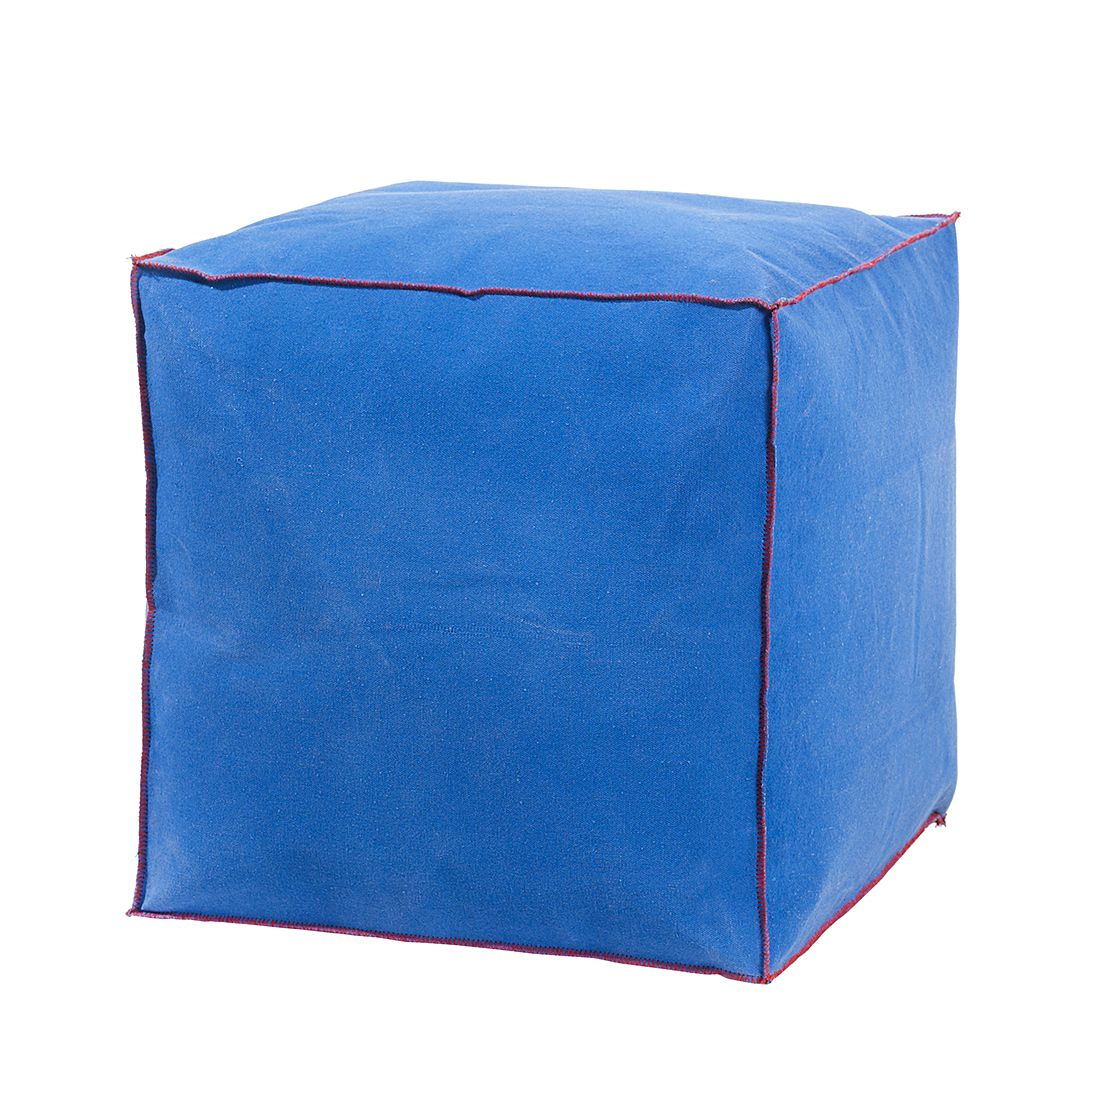 Sitzwürfel Otto – Blau, Serax jetzt kaufen